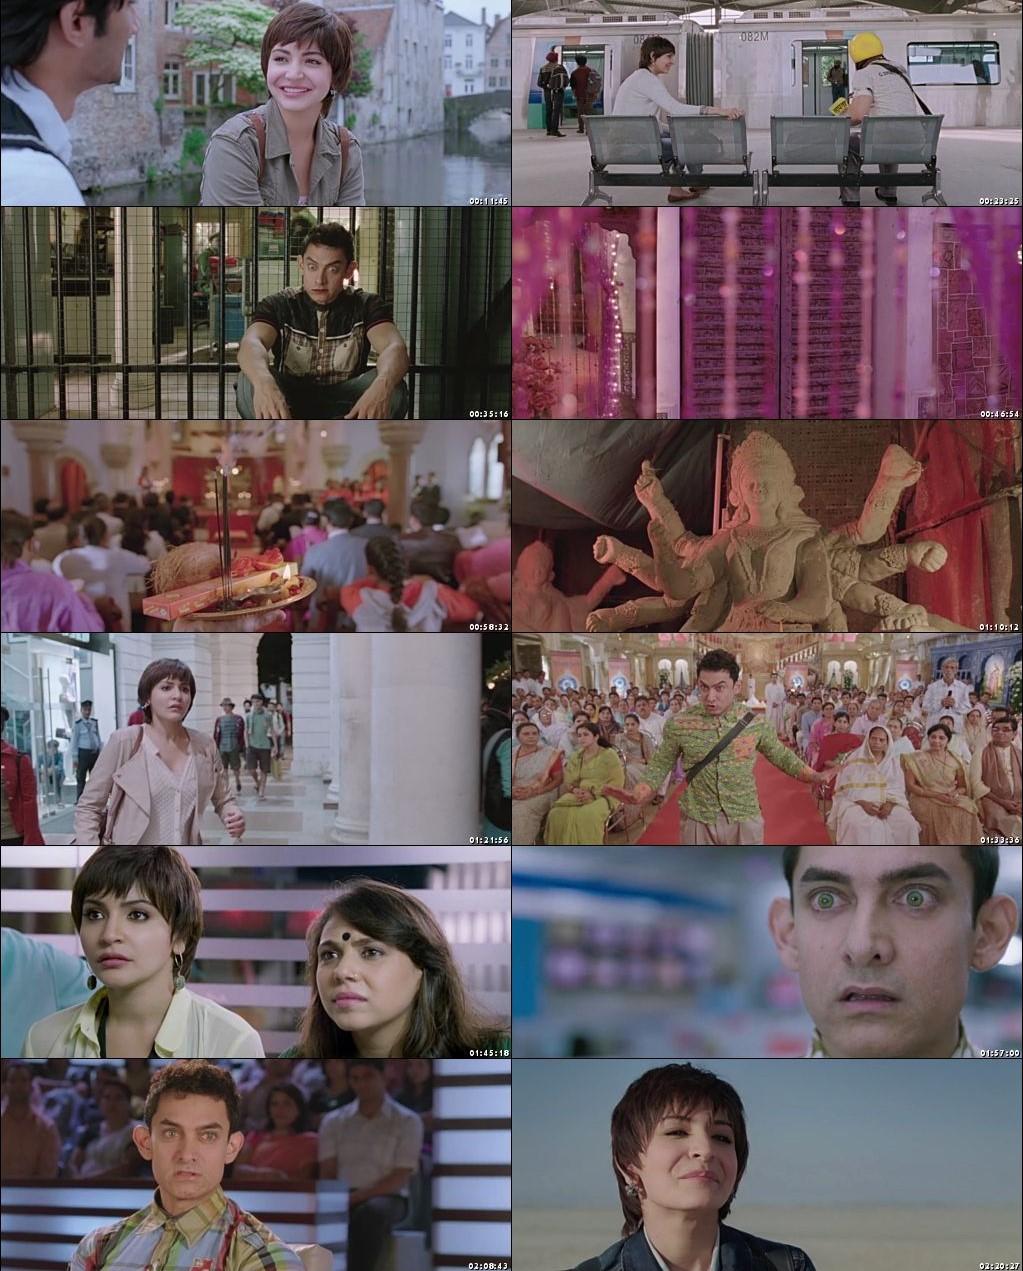 PK 2014 Full Hindi Movie Online Watch